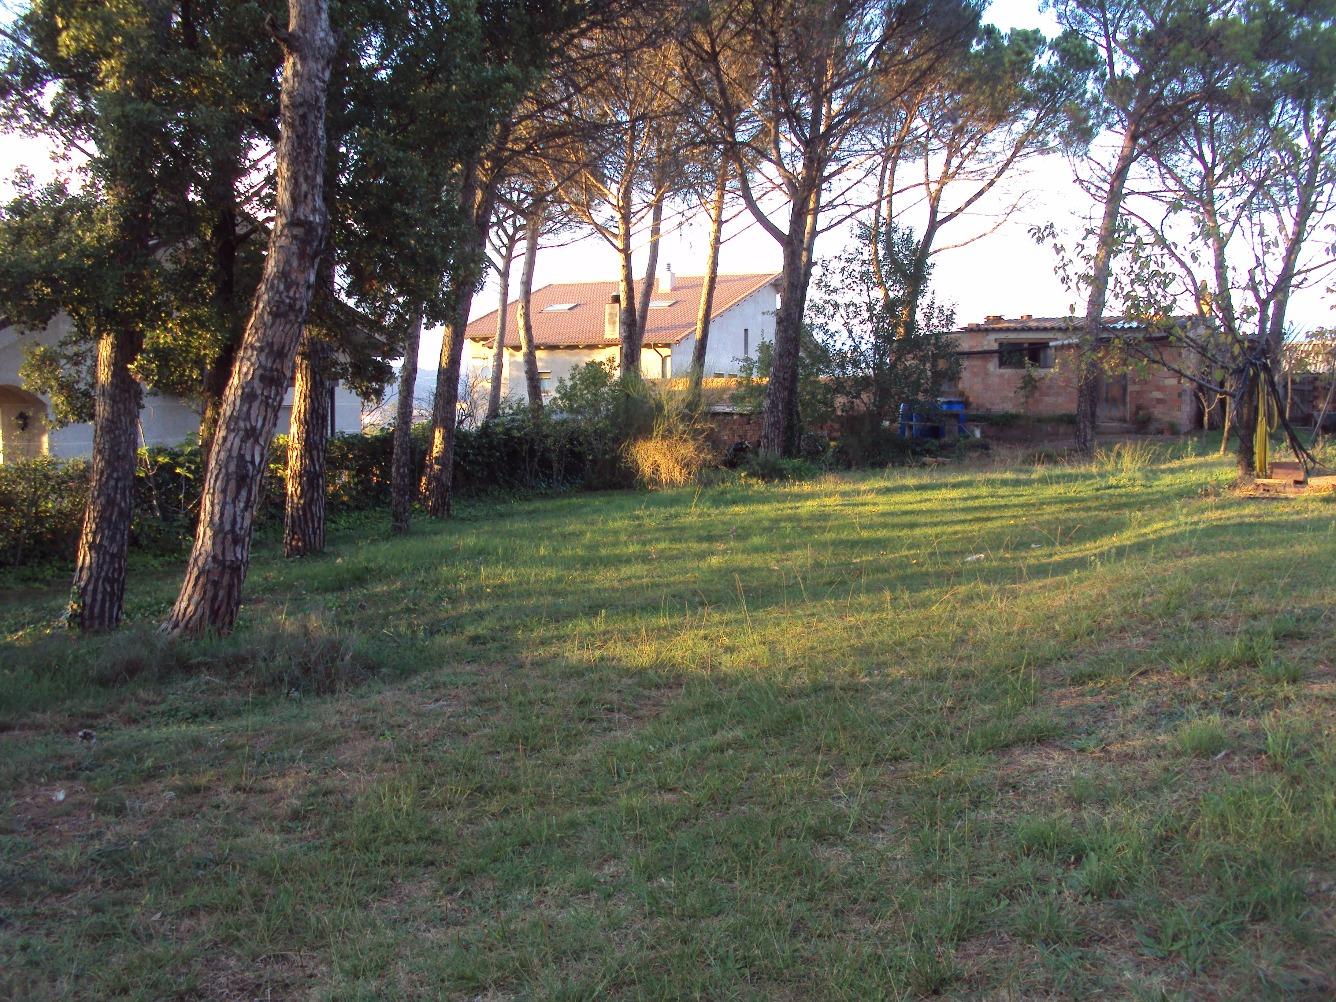 Terrain urbain  Berguedà - Gironella. Parcela urbana a la urbanitzacio cal ramons